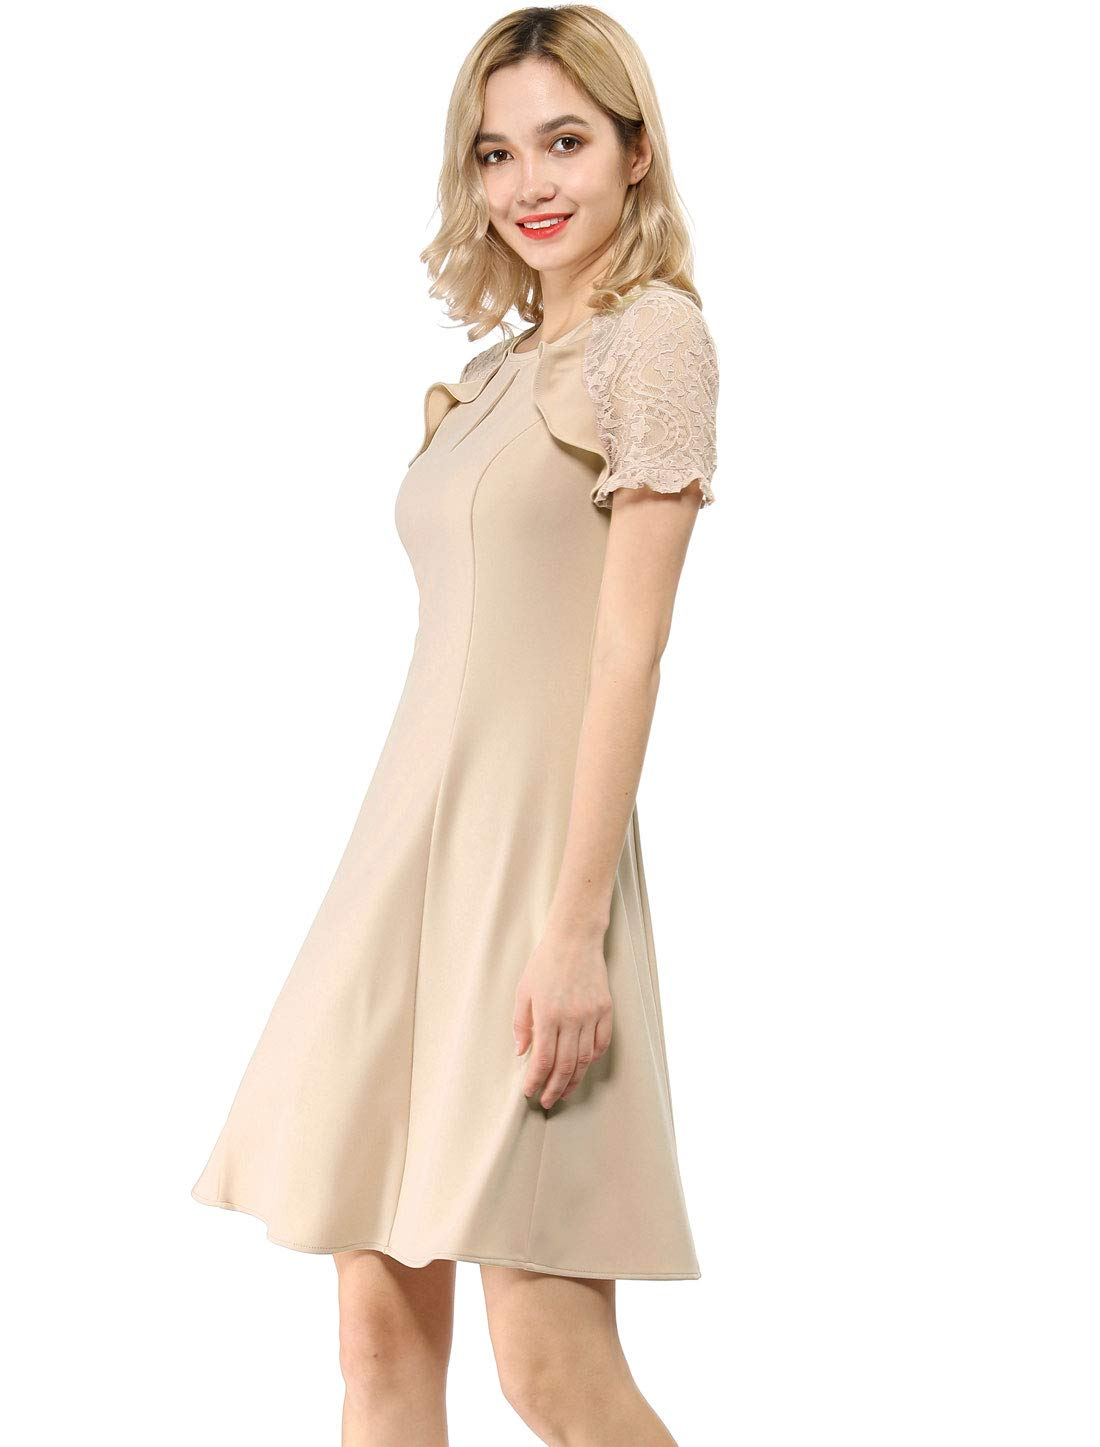 Allegra K 女式荷叶边锁眼蕾丝袖修身喇叭连衣裙